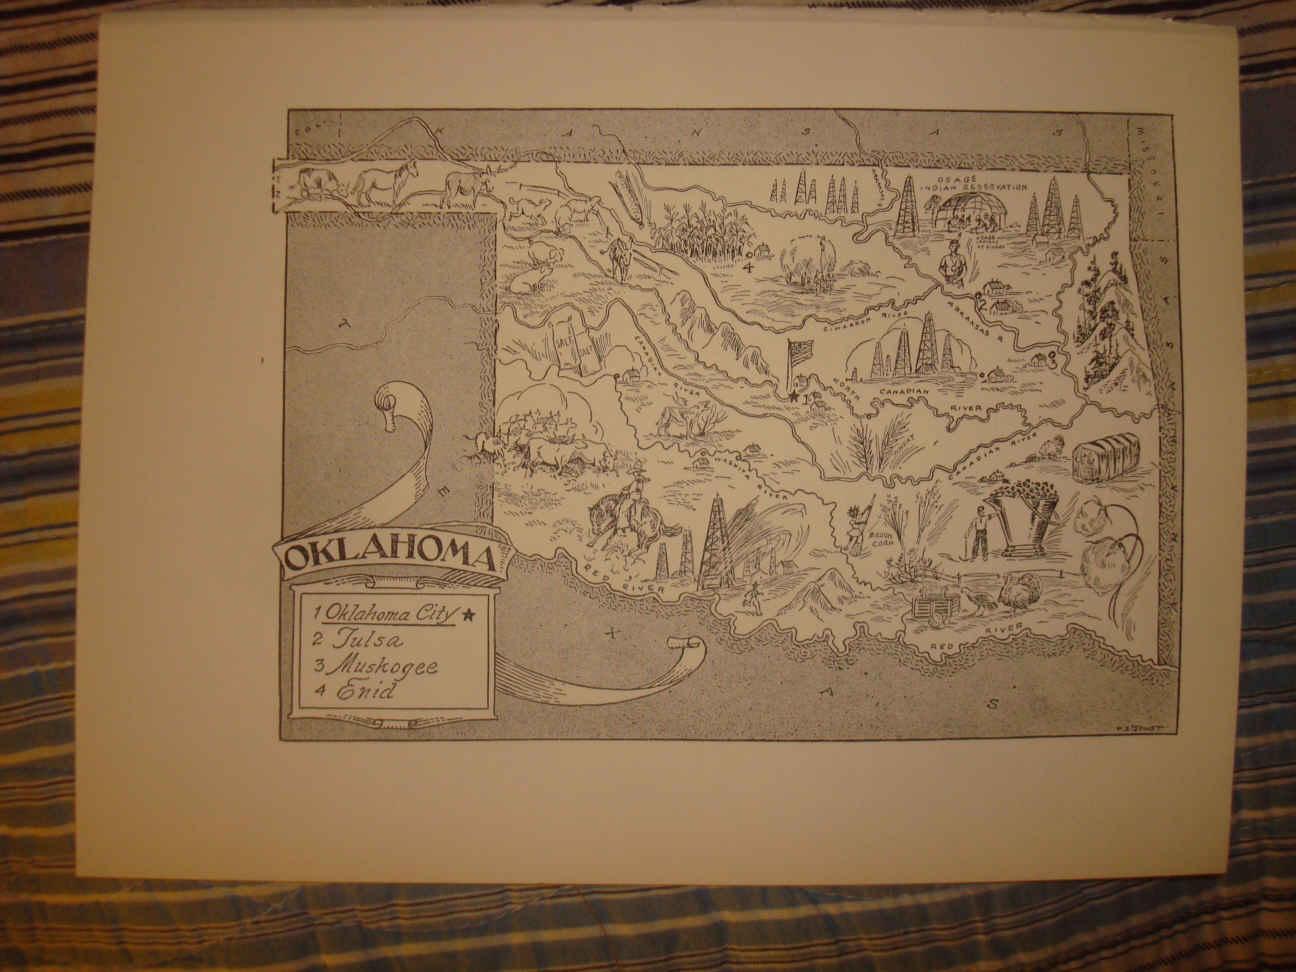 1892 OK MAP OKLAHOMA McINTOSH MAJOR MARSHALL MAYES MURRAY MUSKOGEE NOBLE NOWATA